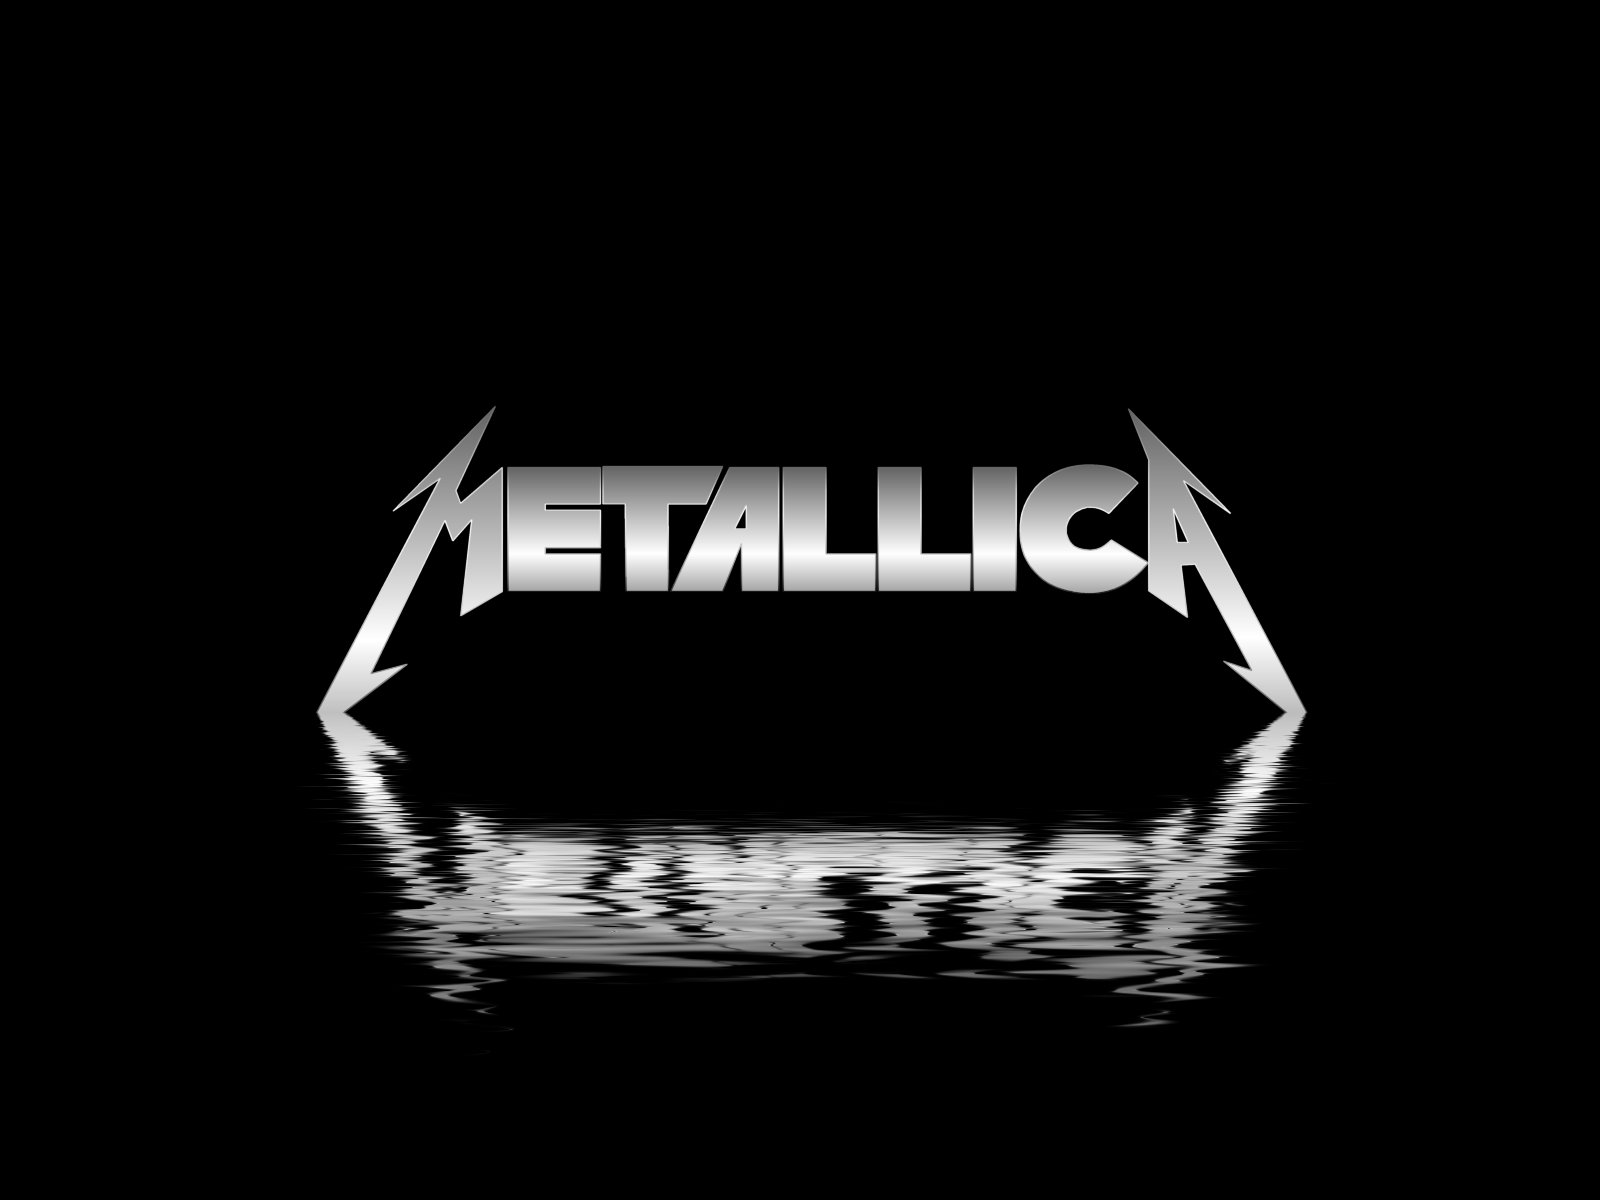 metallica water logo wallpaper 1600x1200